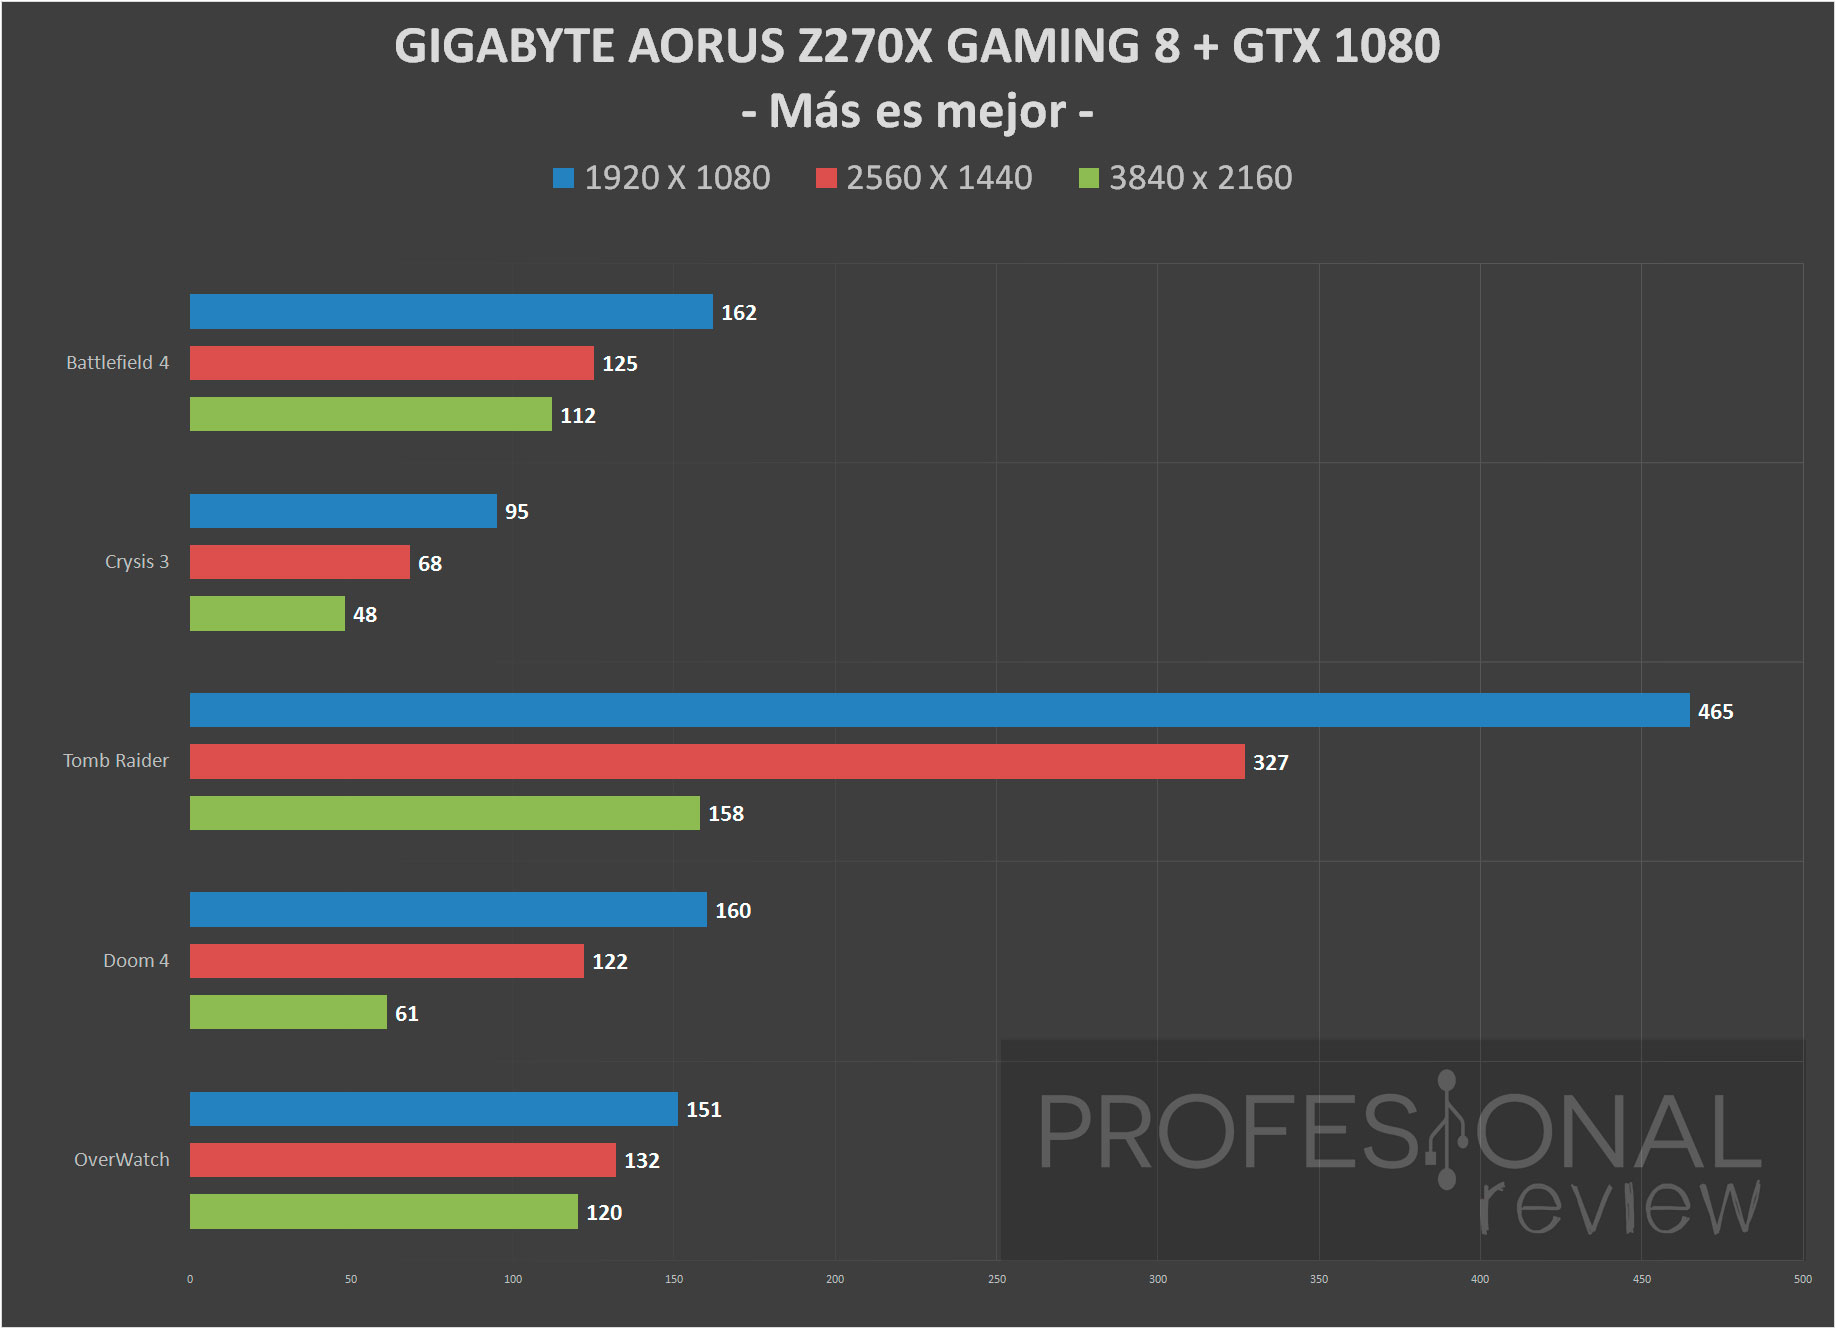 Gigabyte Aorus Z270X Gaming 8 juegos